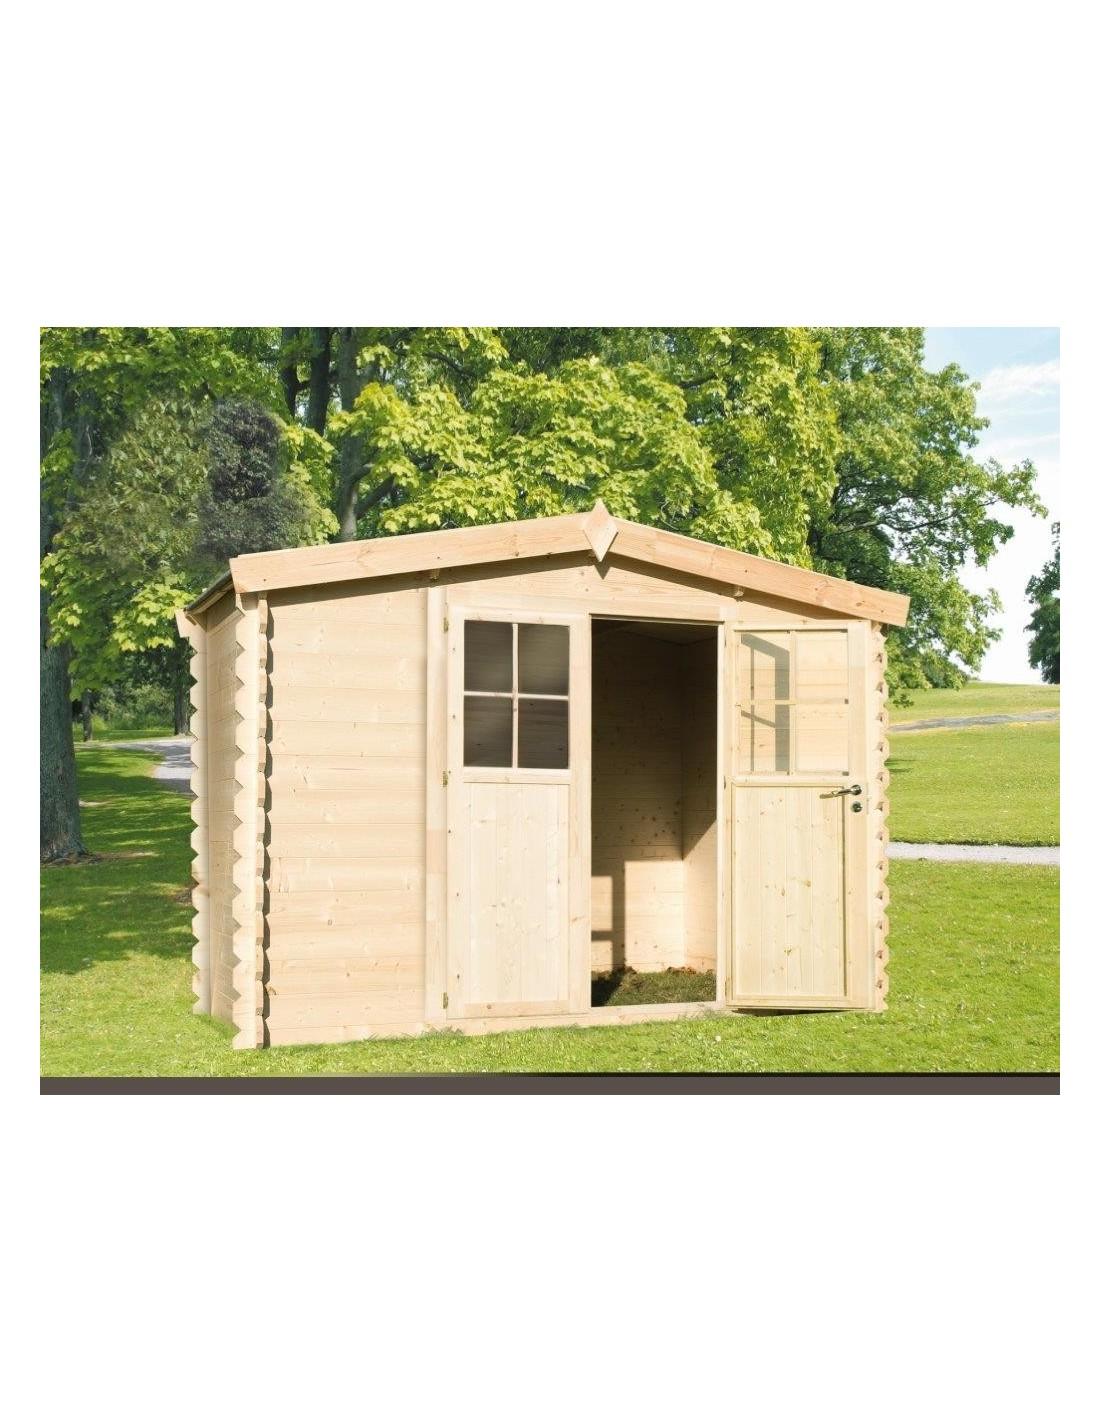 chalet de jardin en bois 3x2m p 19mm2. Black Bedroom Furniture Sets. Home Design Ideas